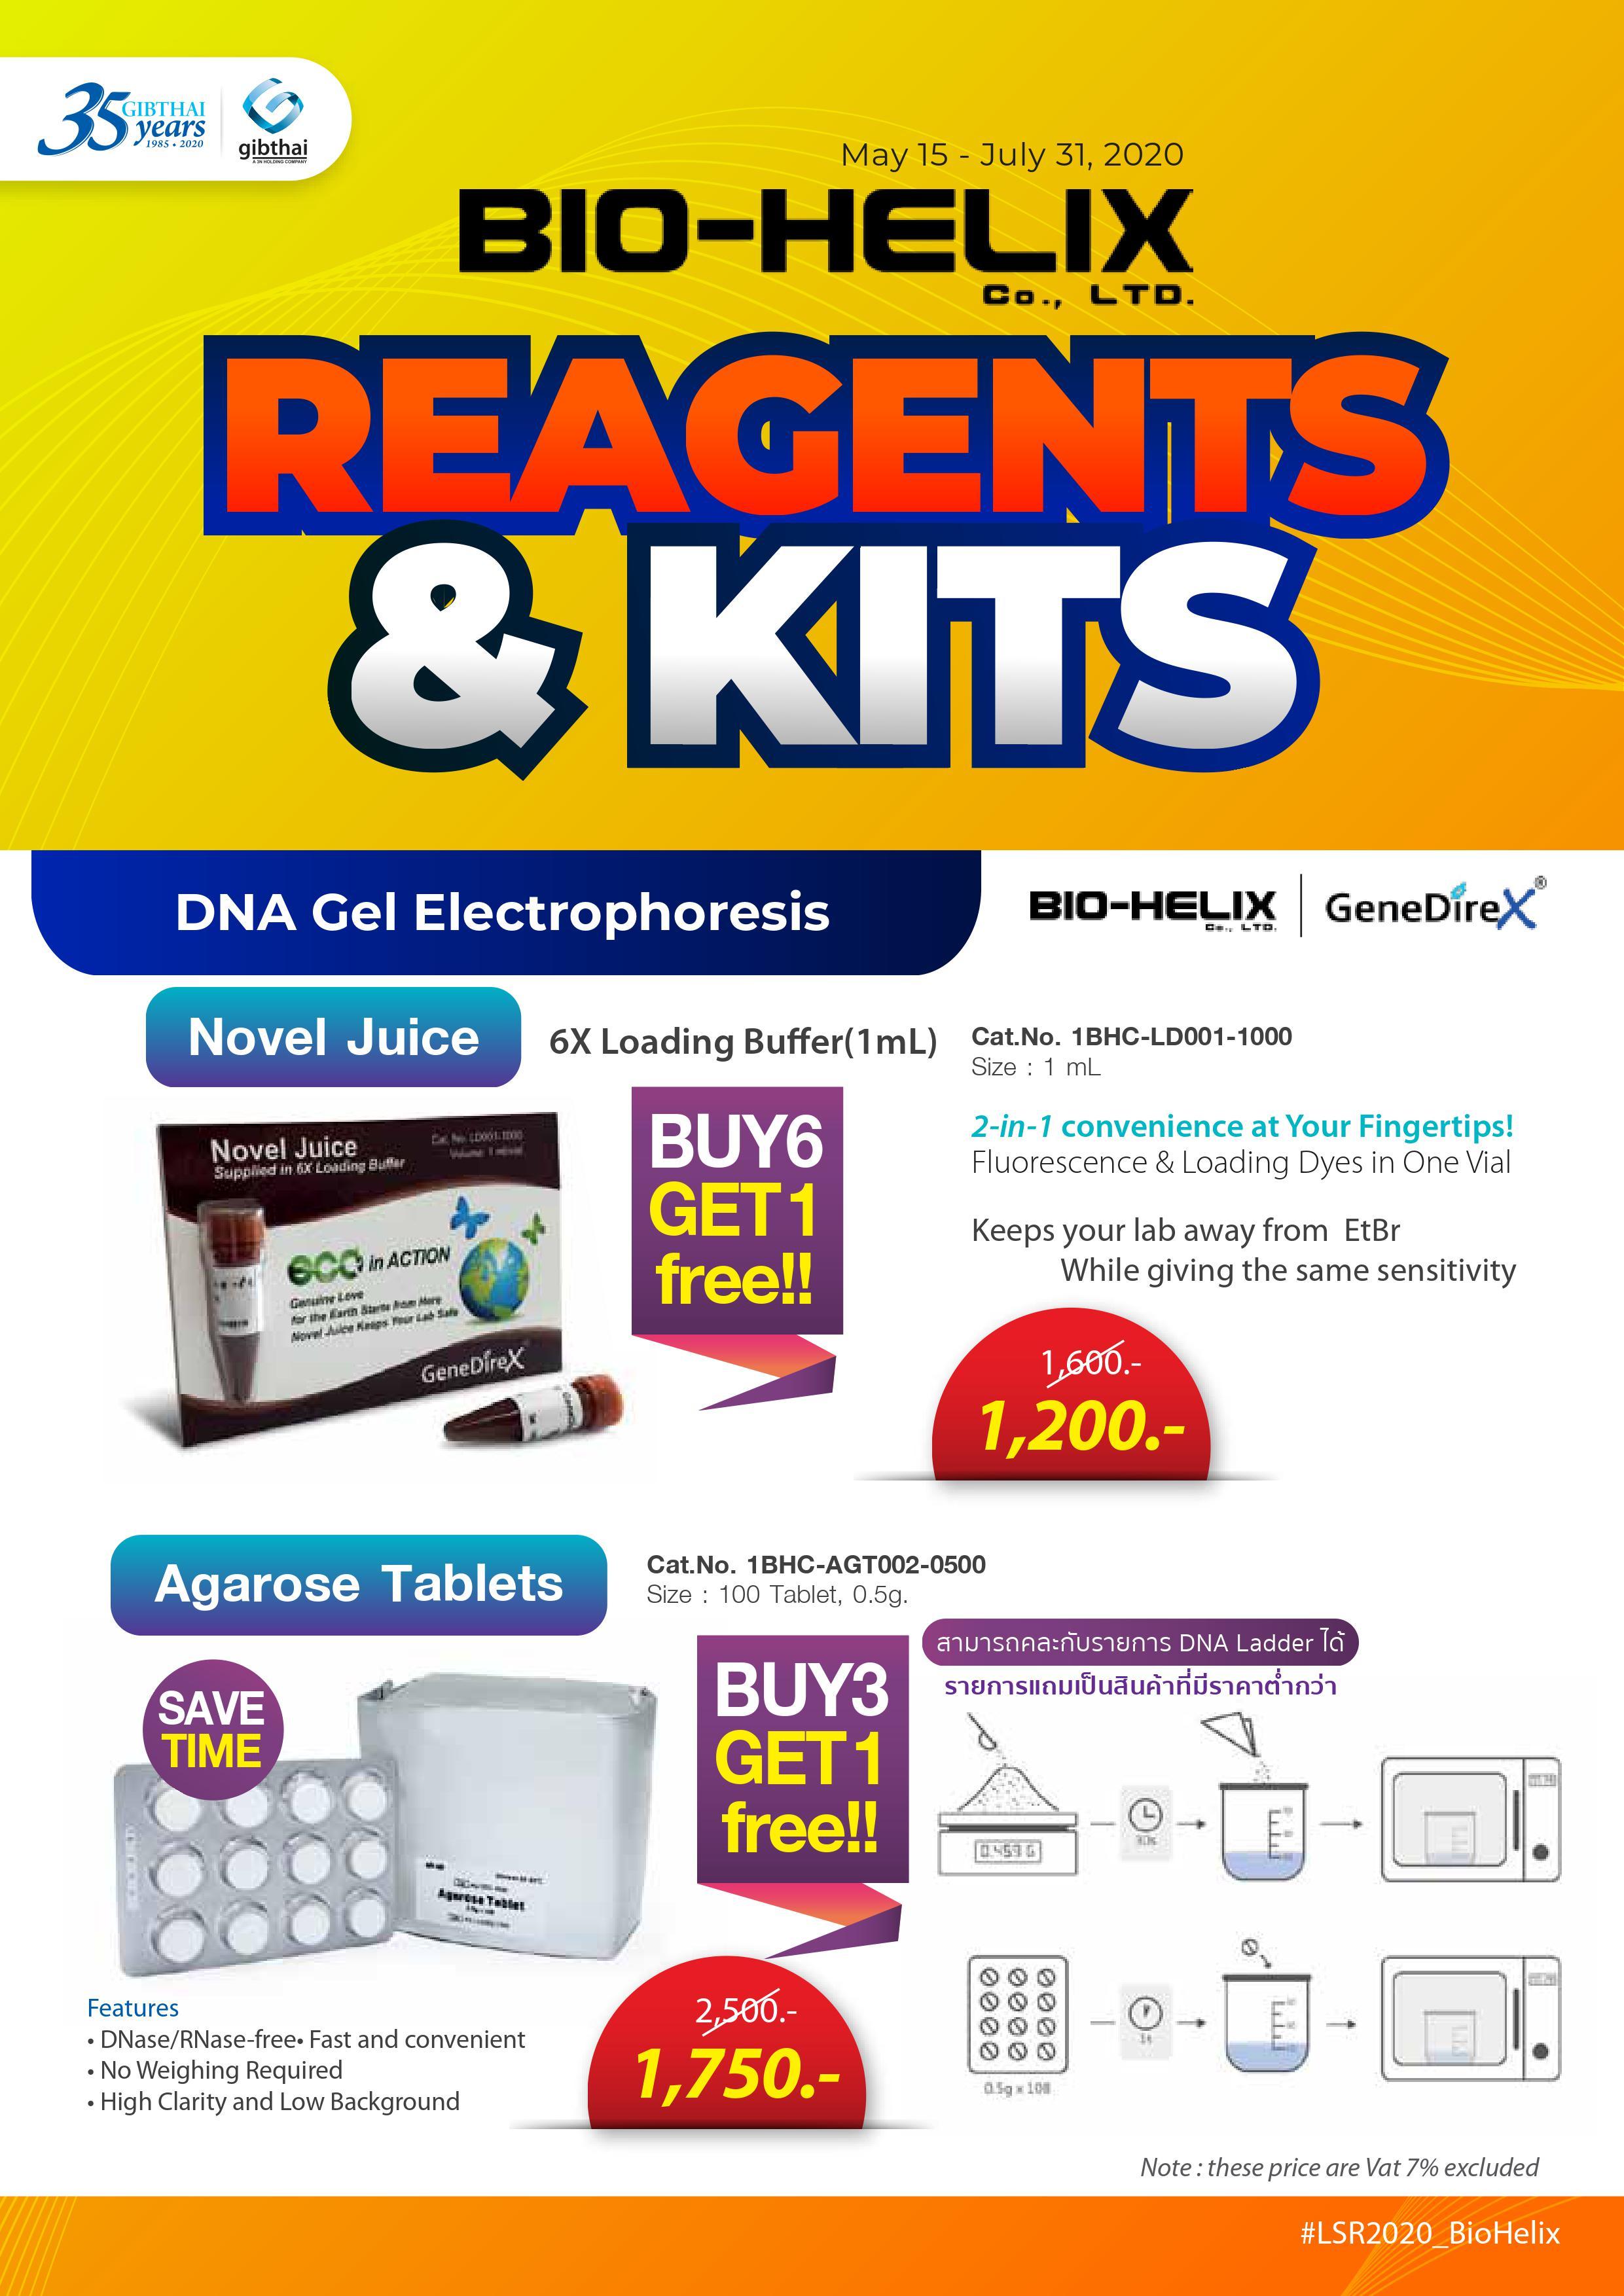 BioHelix Reagents & Kits